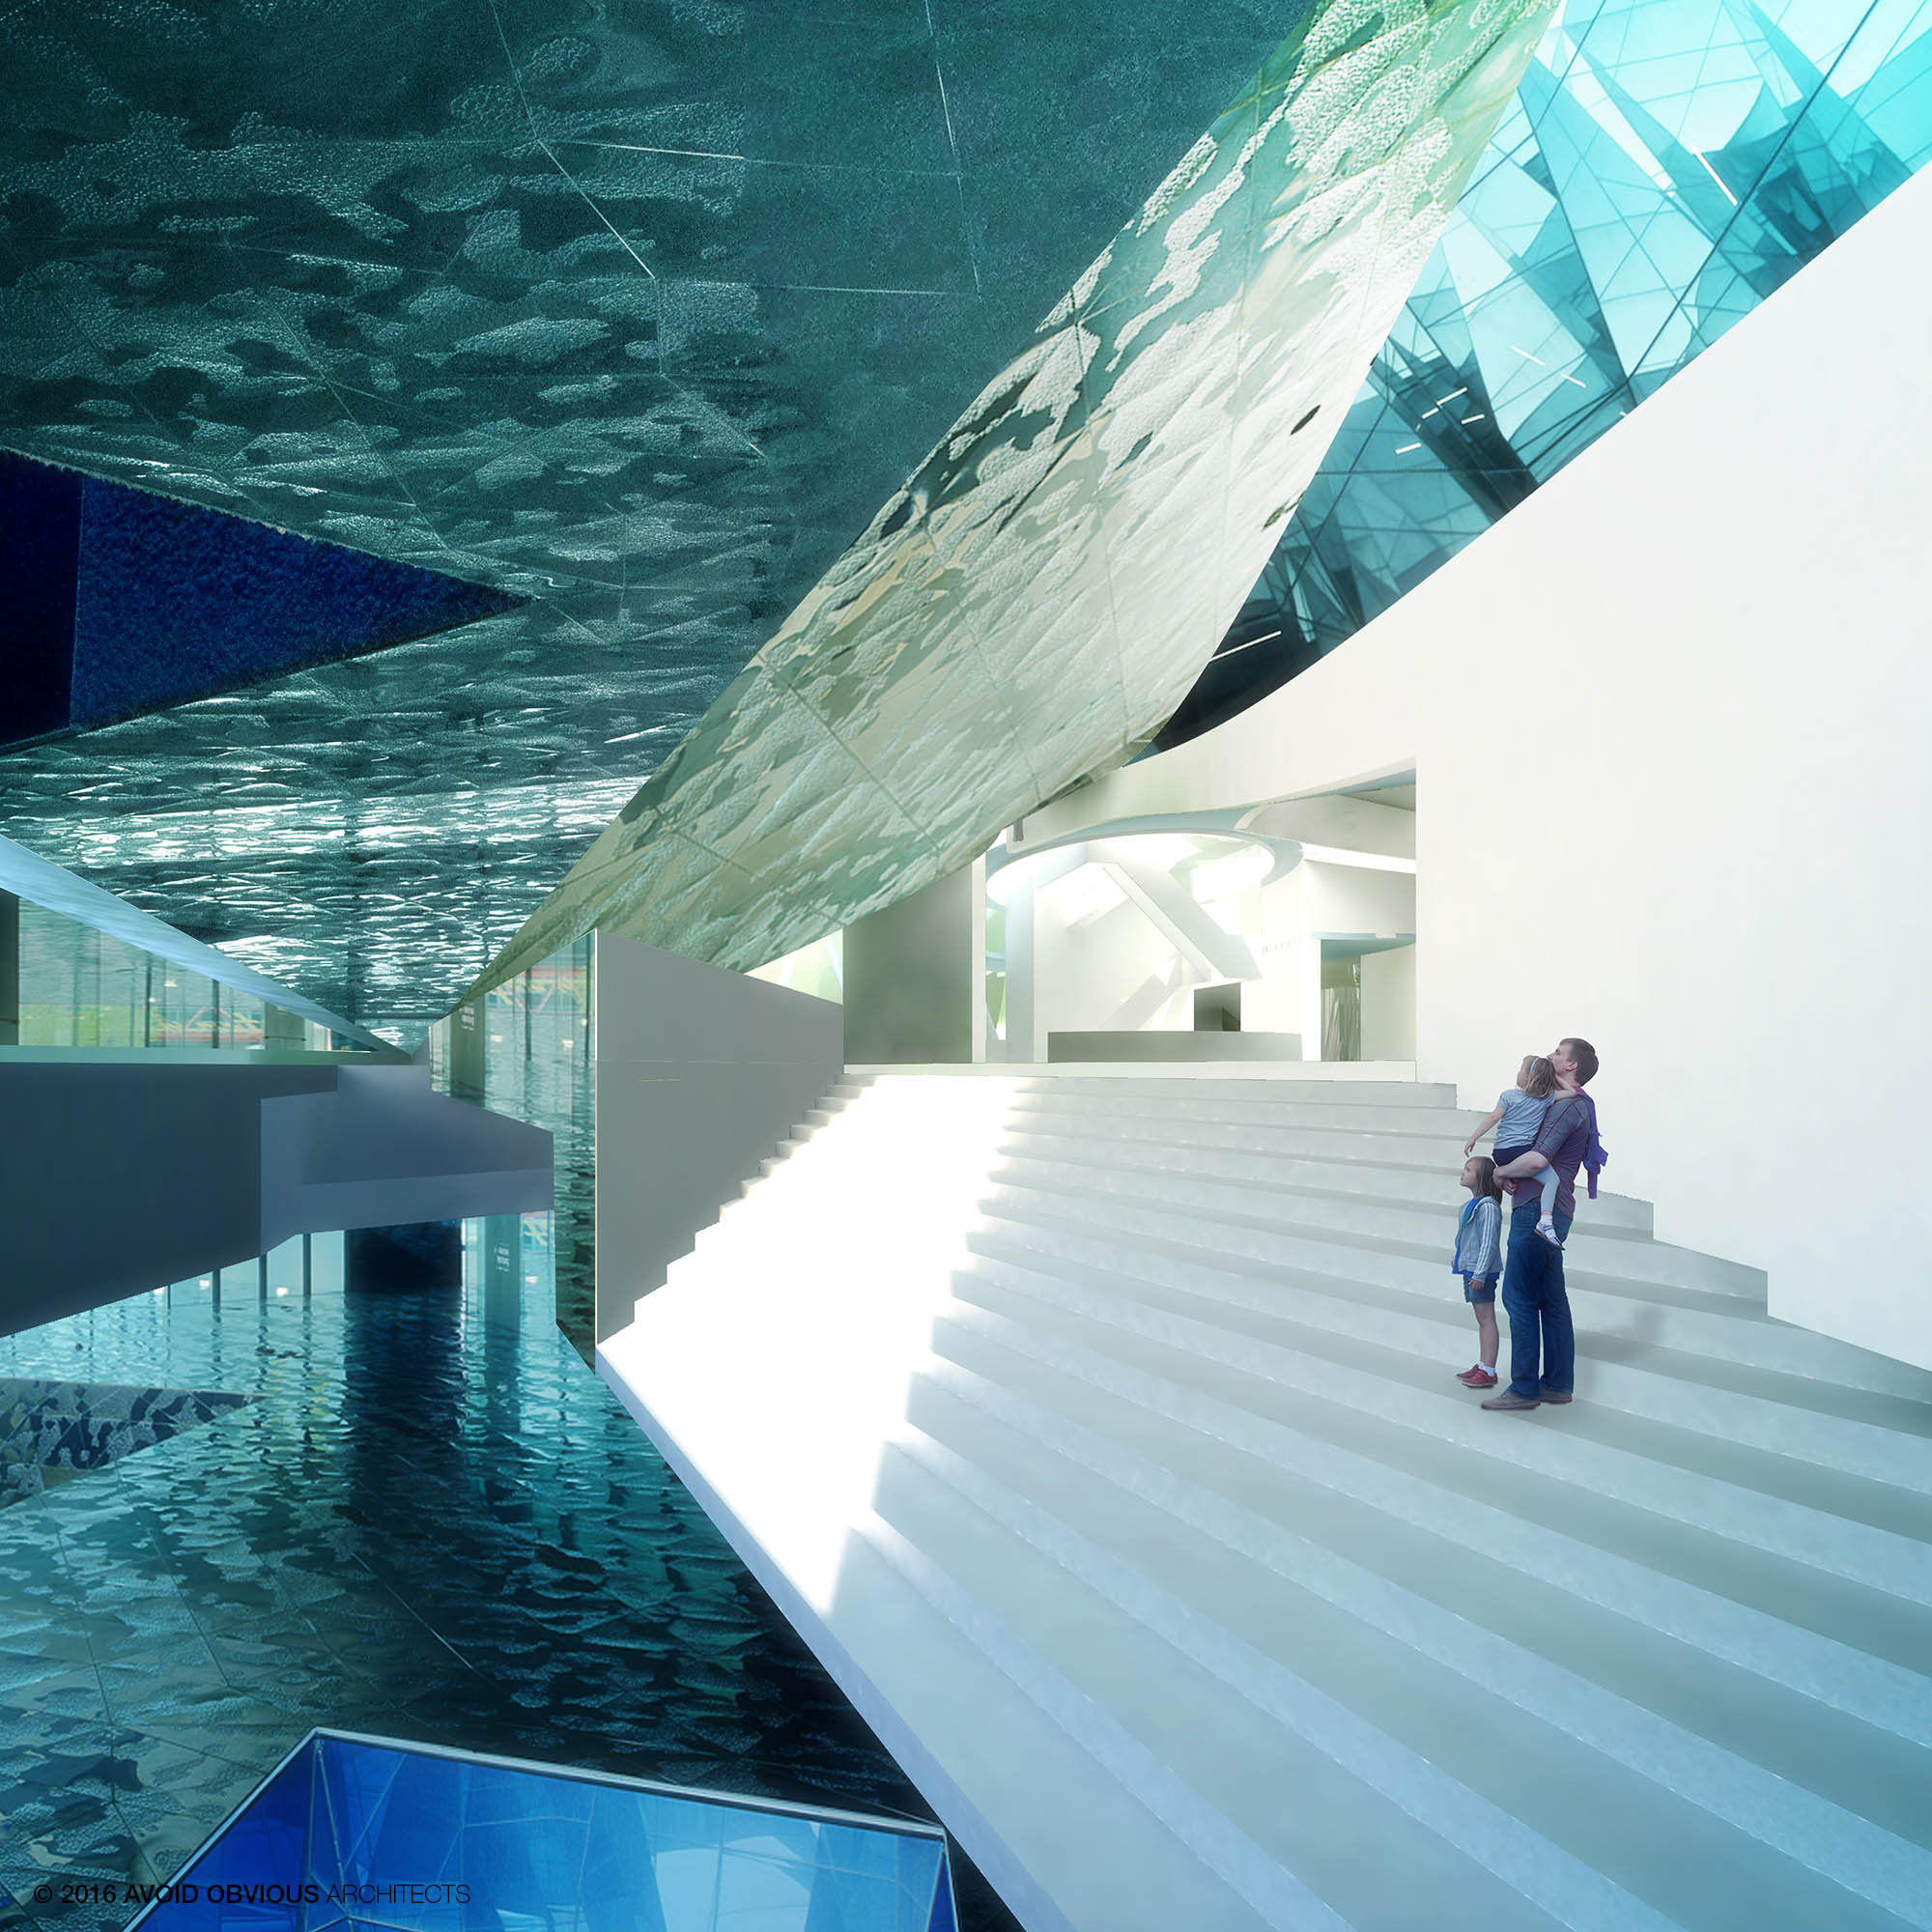 How To Design A Fictional Building